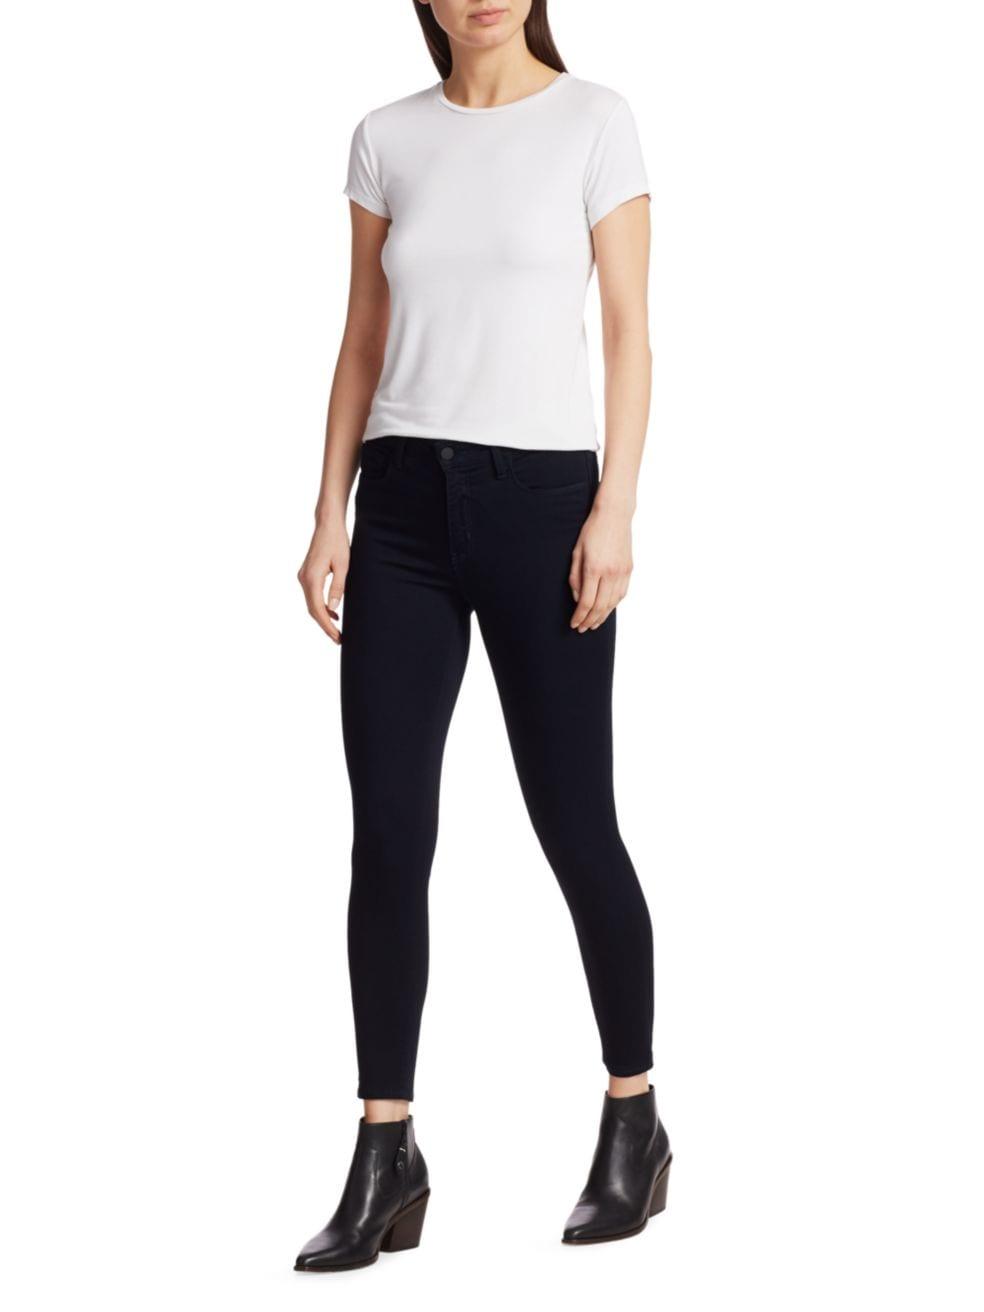 L'Agence Margot High-Rise Ankle Skinny Jeans   SaksFifthAvenue